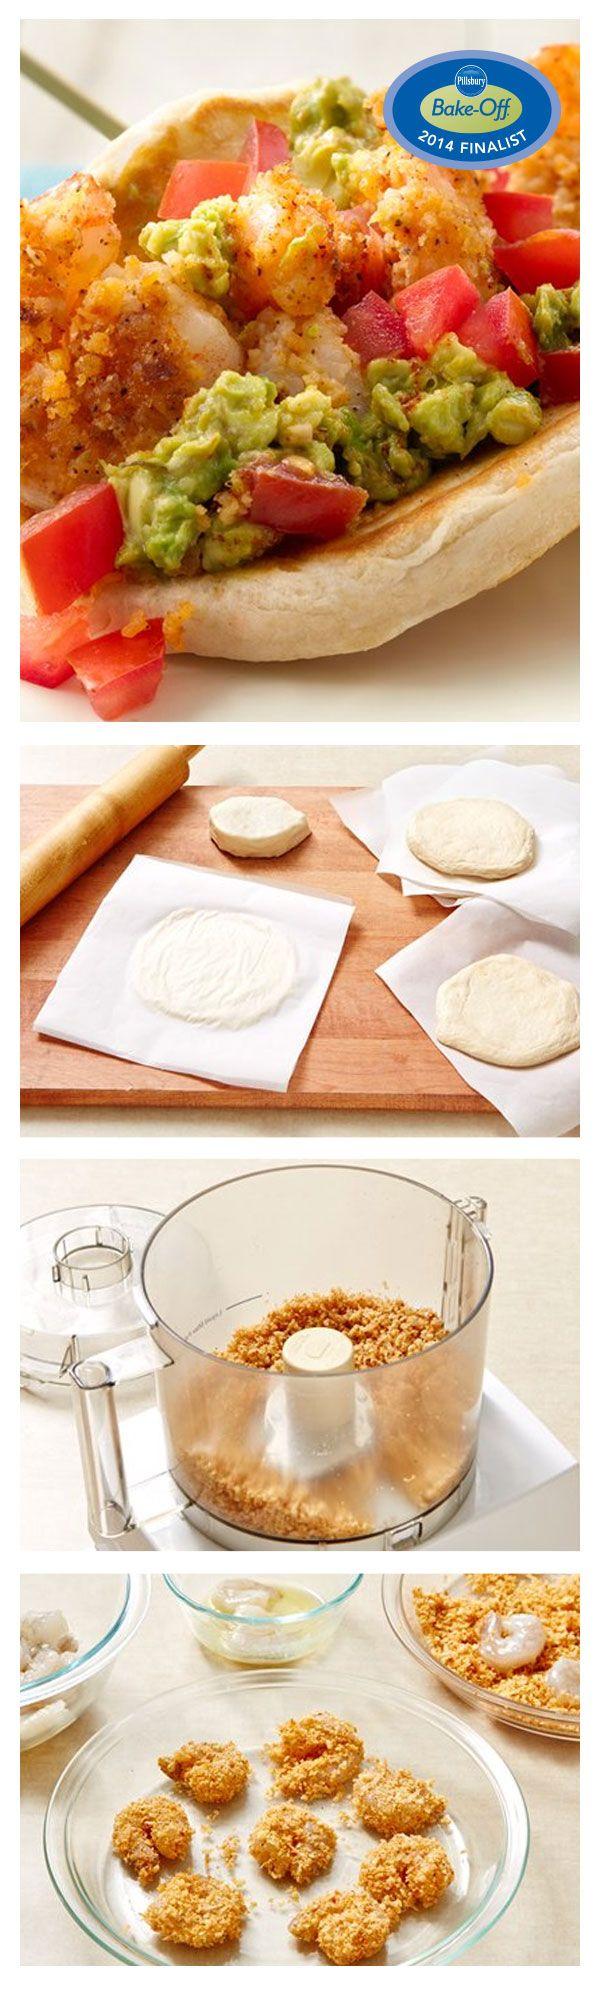 ... Tacos on Pinterest | Taco recipe, Sweet potato tacos and Chicken tacos